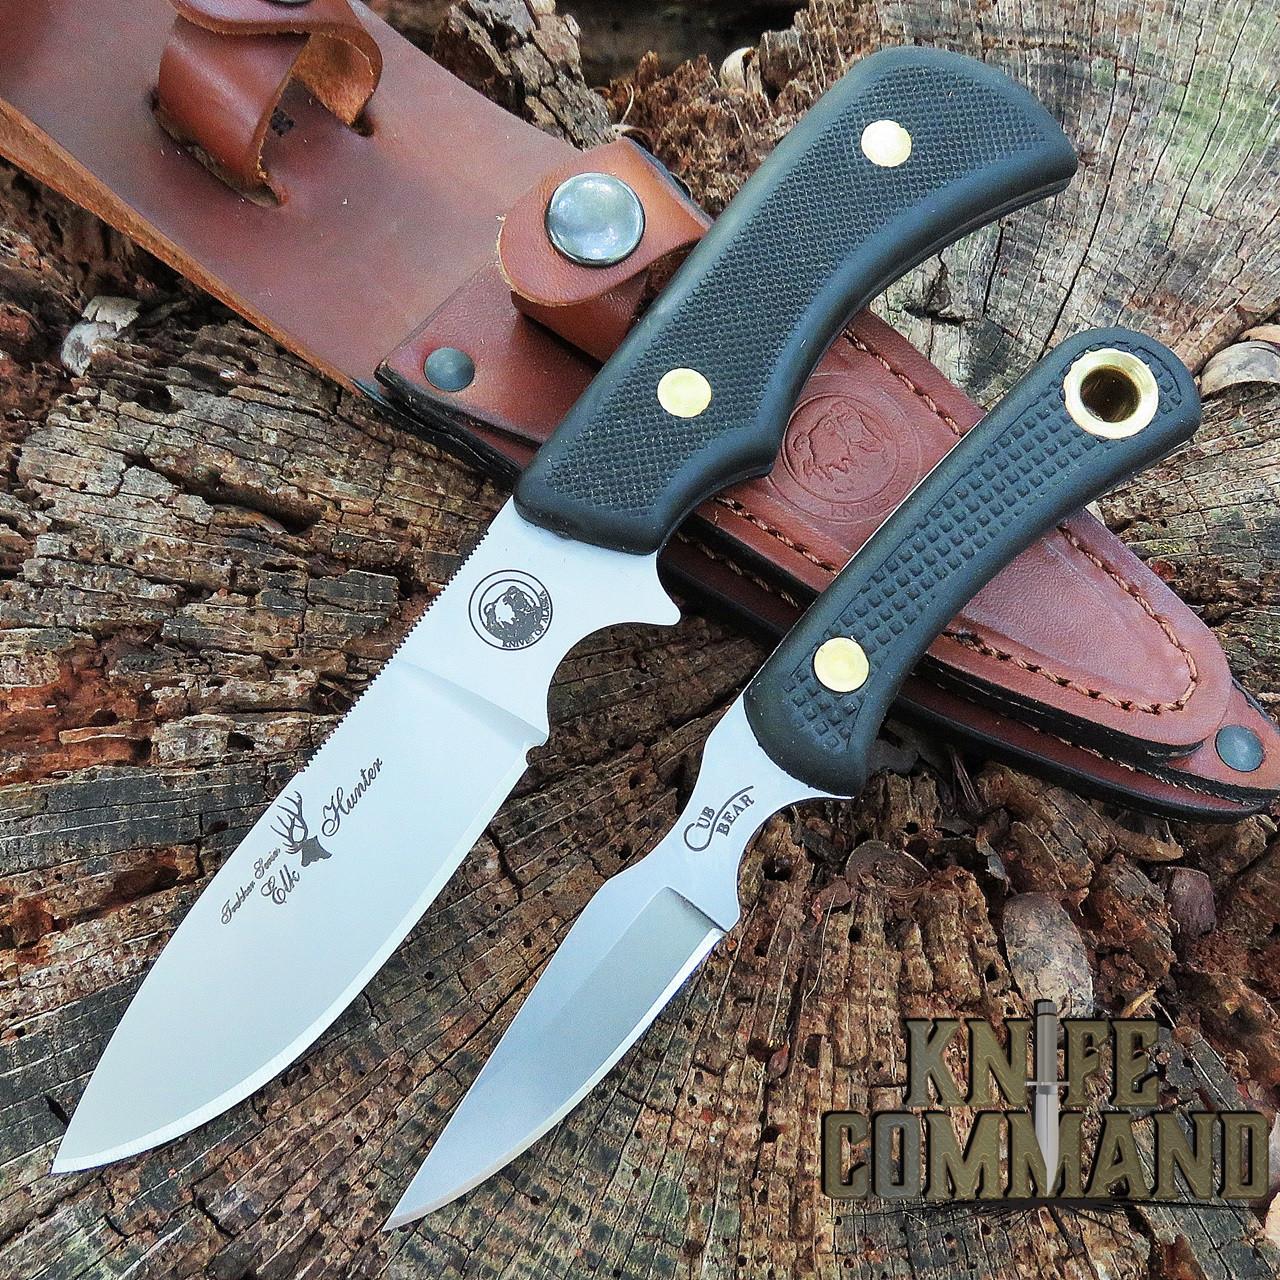 Knives of Alaska Trekker Elk Hunter Suregrip Hunting Knife Combo 00198FG